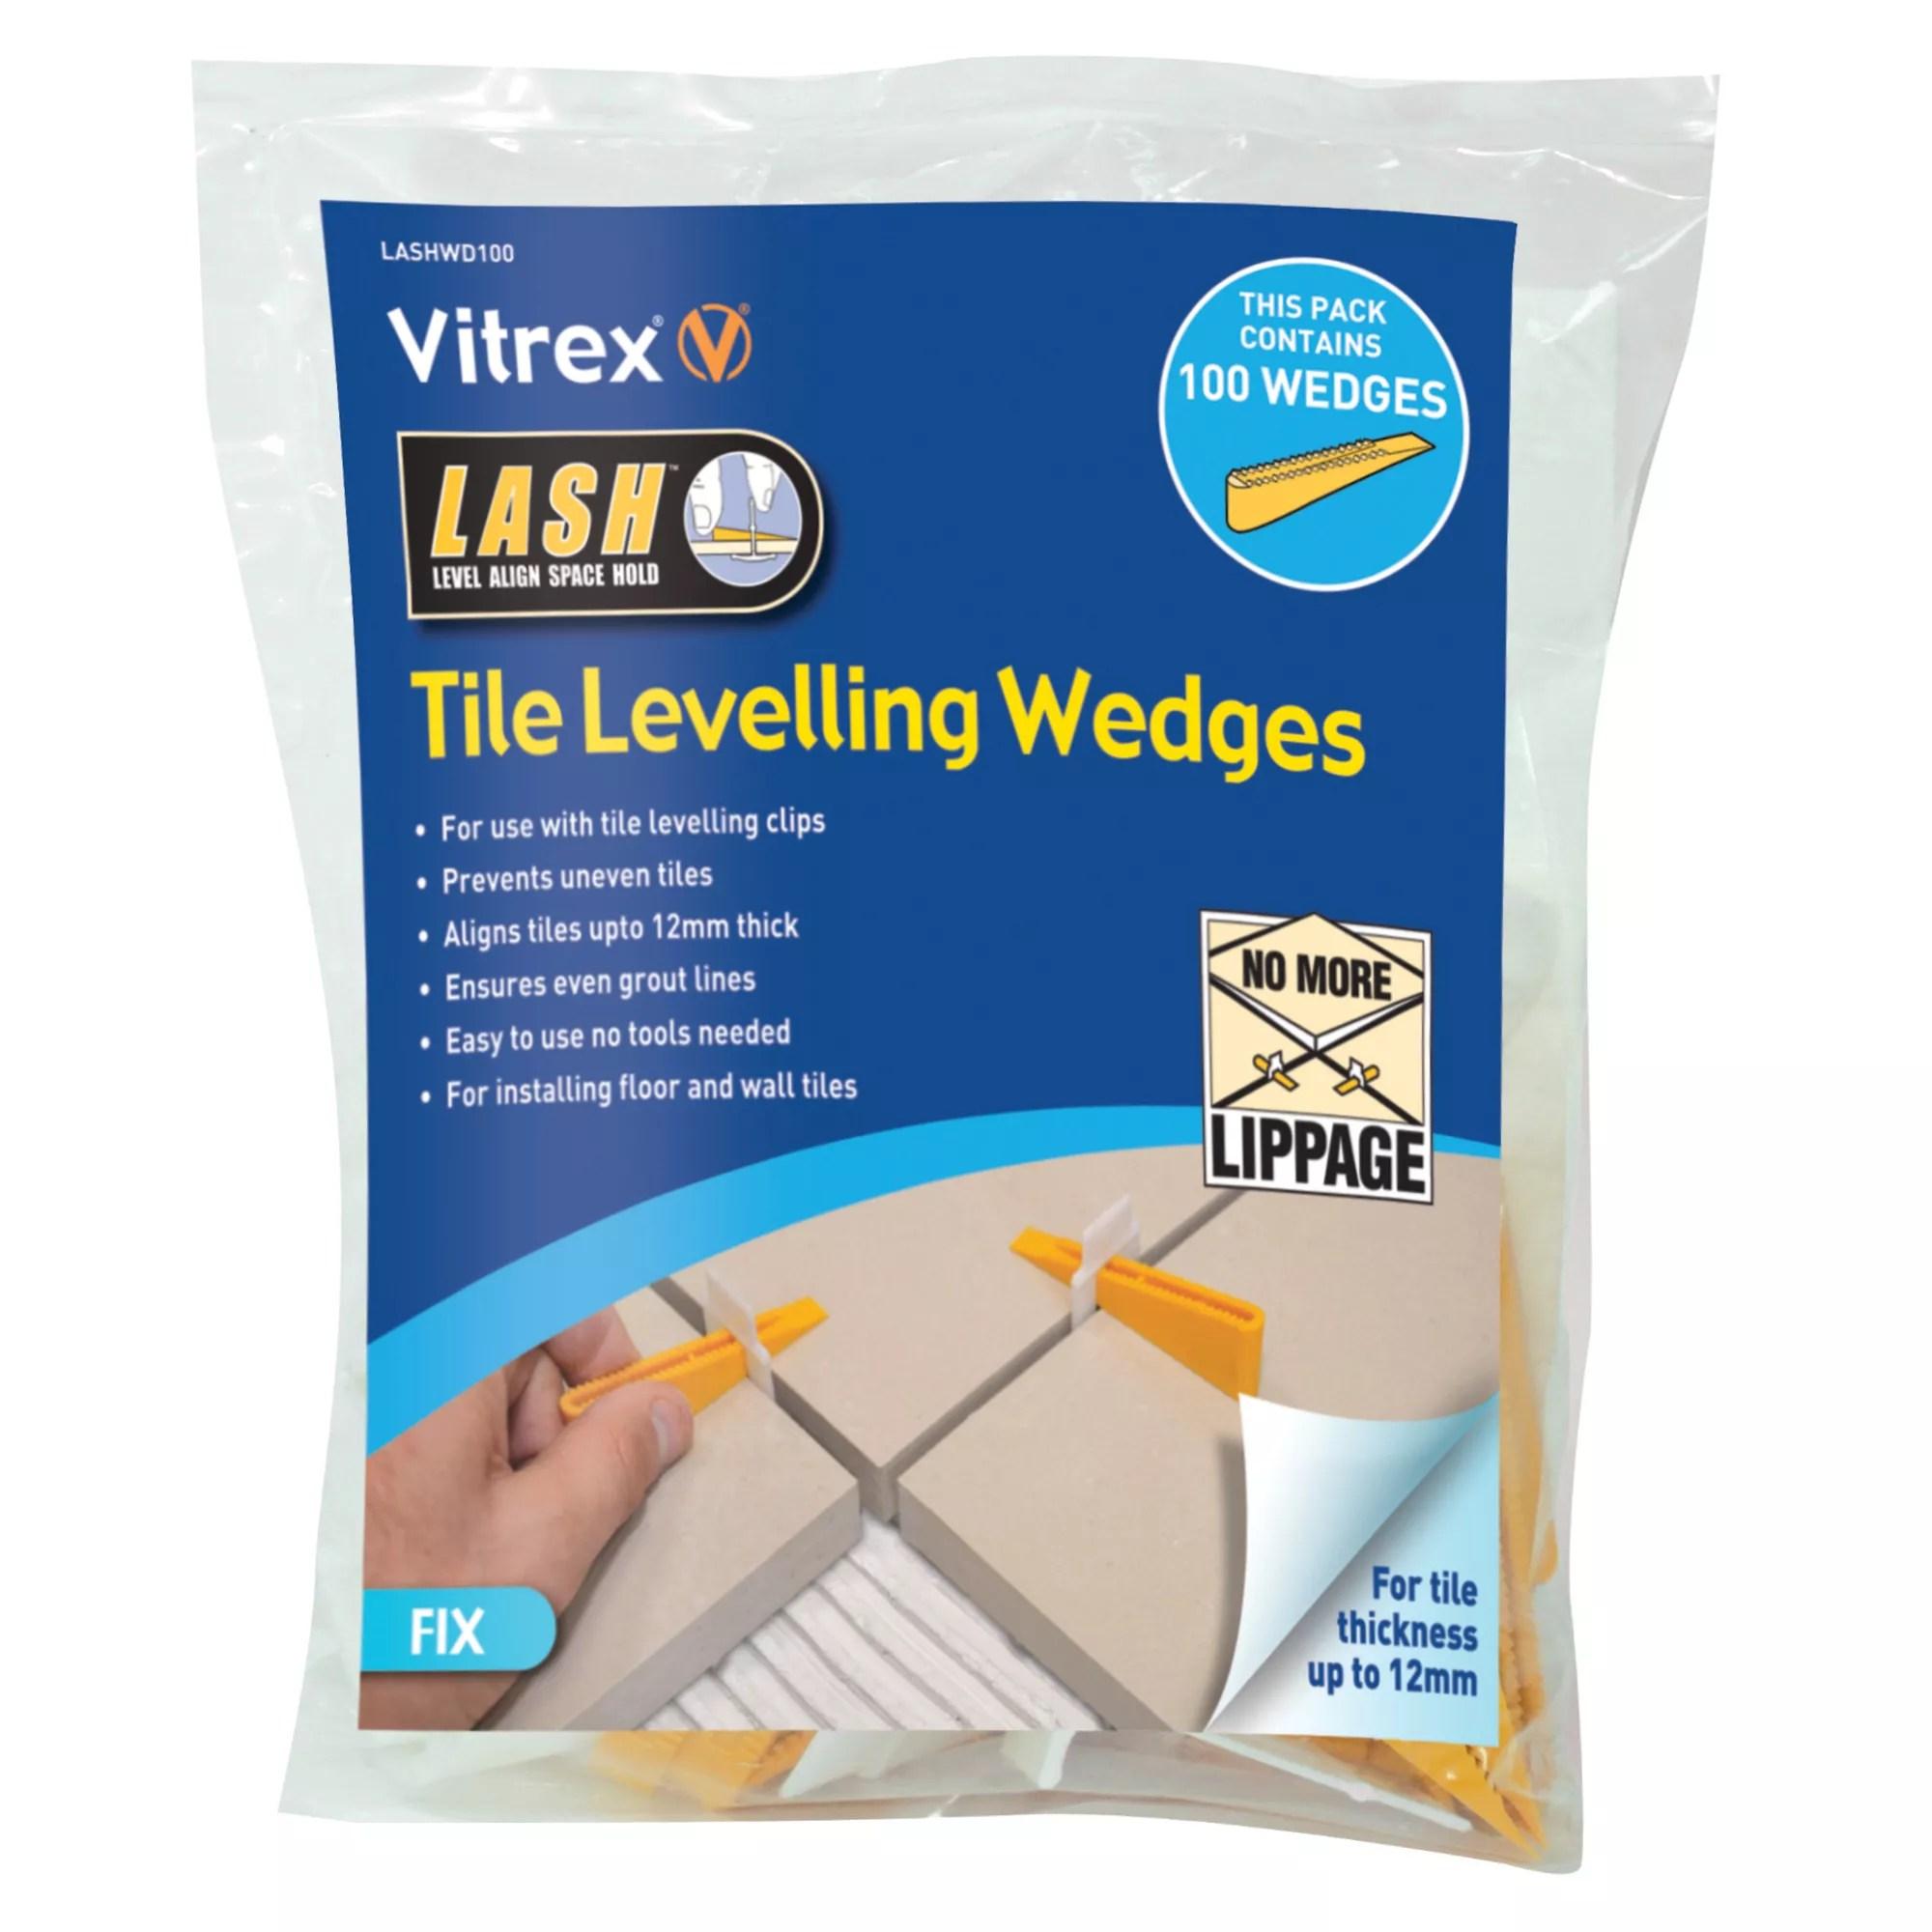 vitrex lashwd100 plastic 155mm tile levelling spacer pack of 100